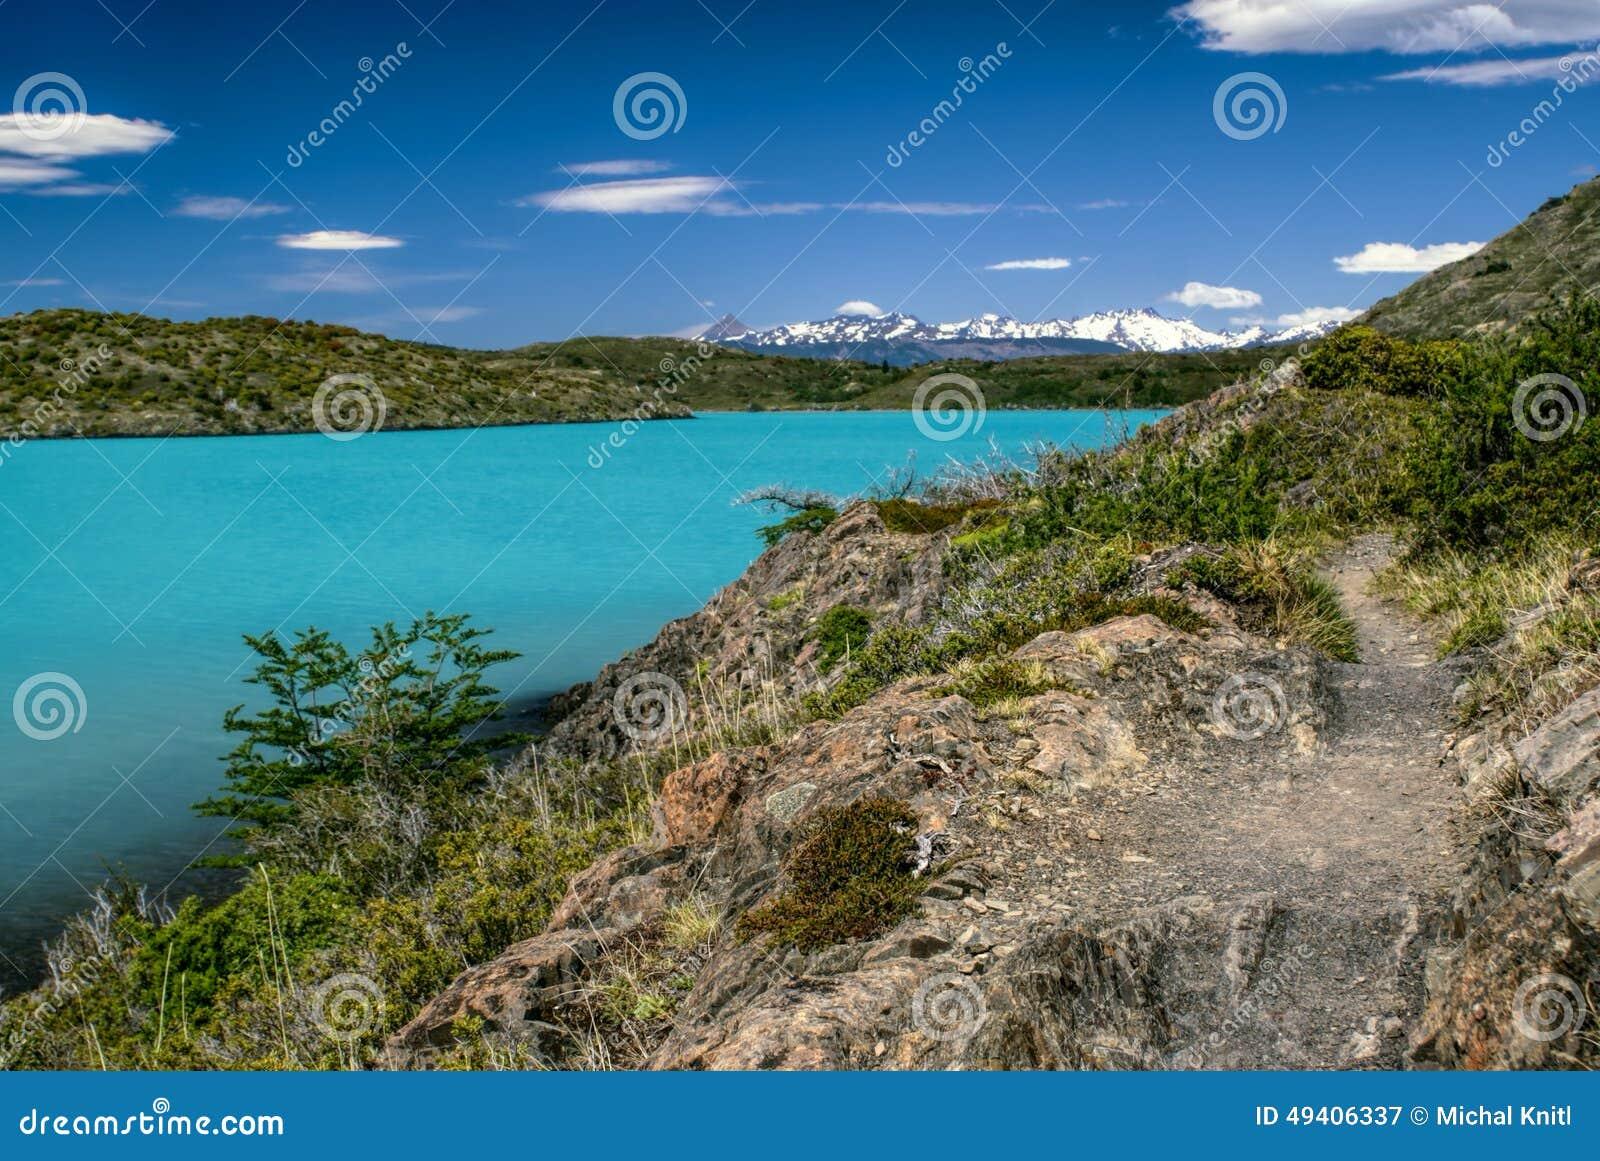 Download Torres Del Paine stockbild. Bild von outdoor, ufer, panoramisch - 49406337